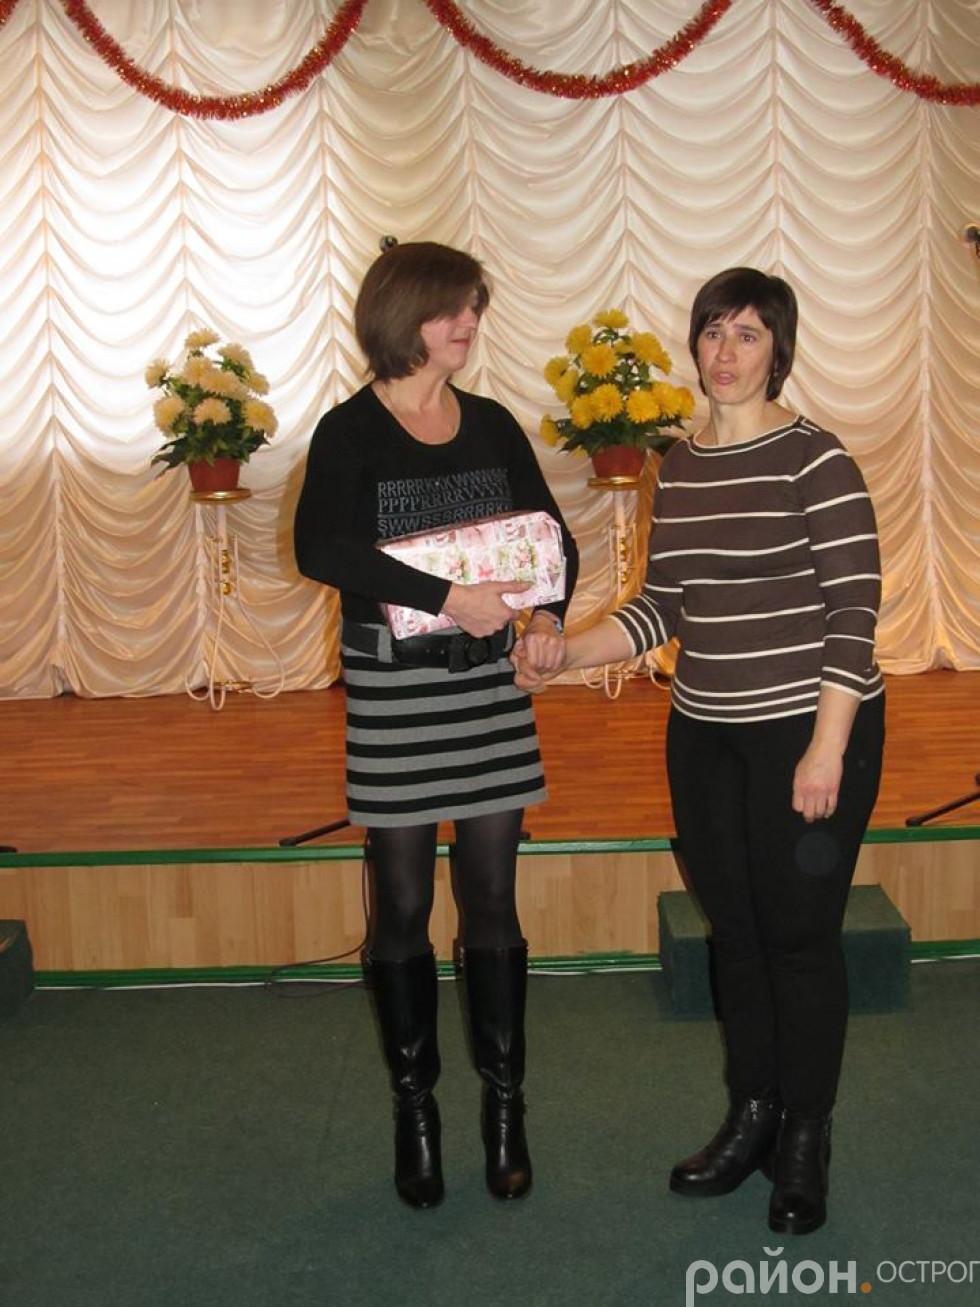 Вдова загиблого в 2015 році Петра Драчука з с. Плоска